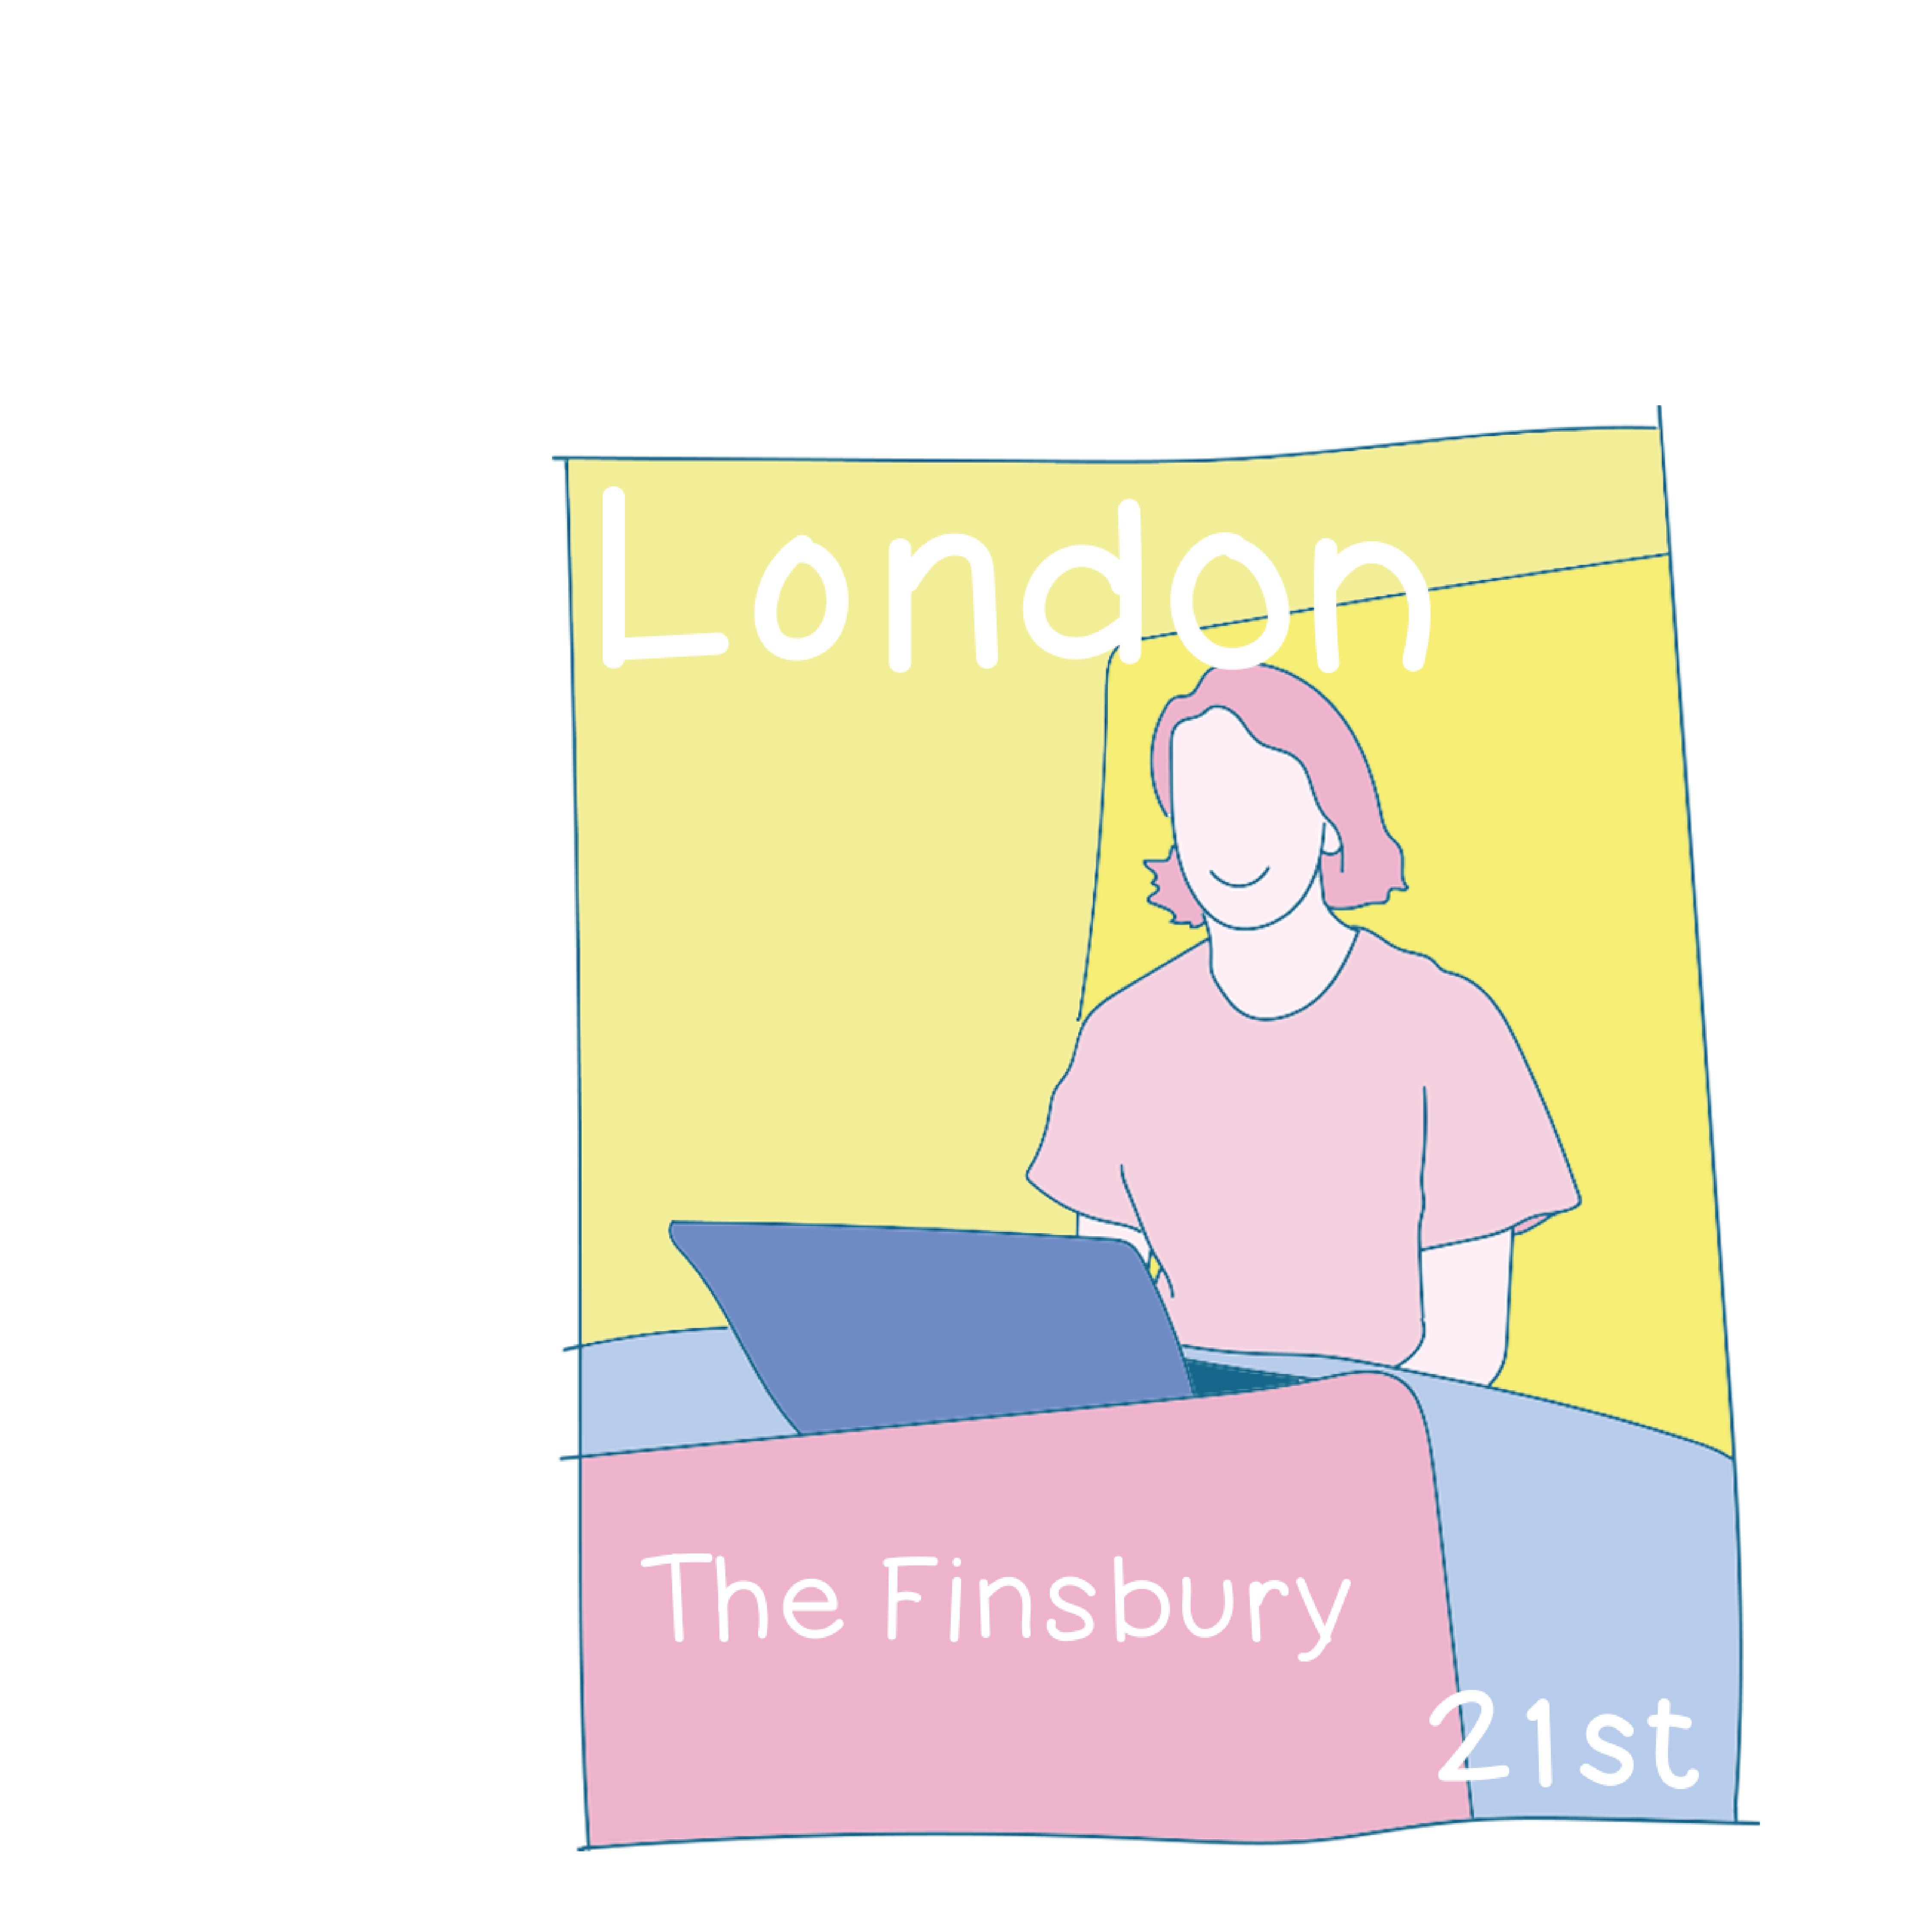 21st - London